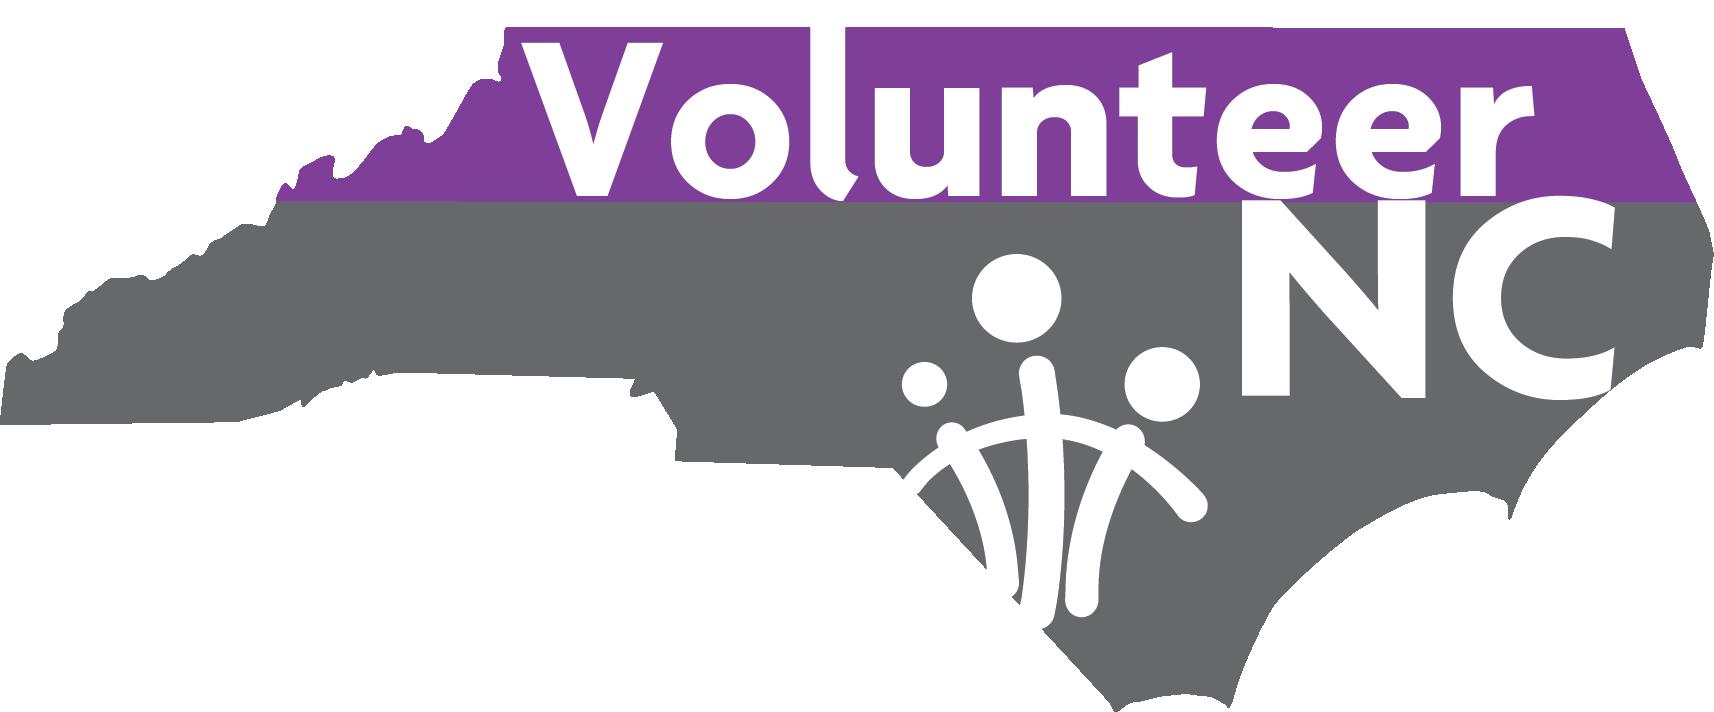 Volunteer NC logo